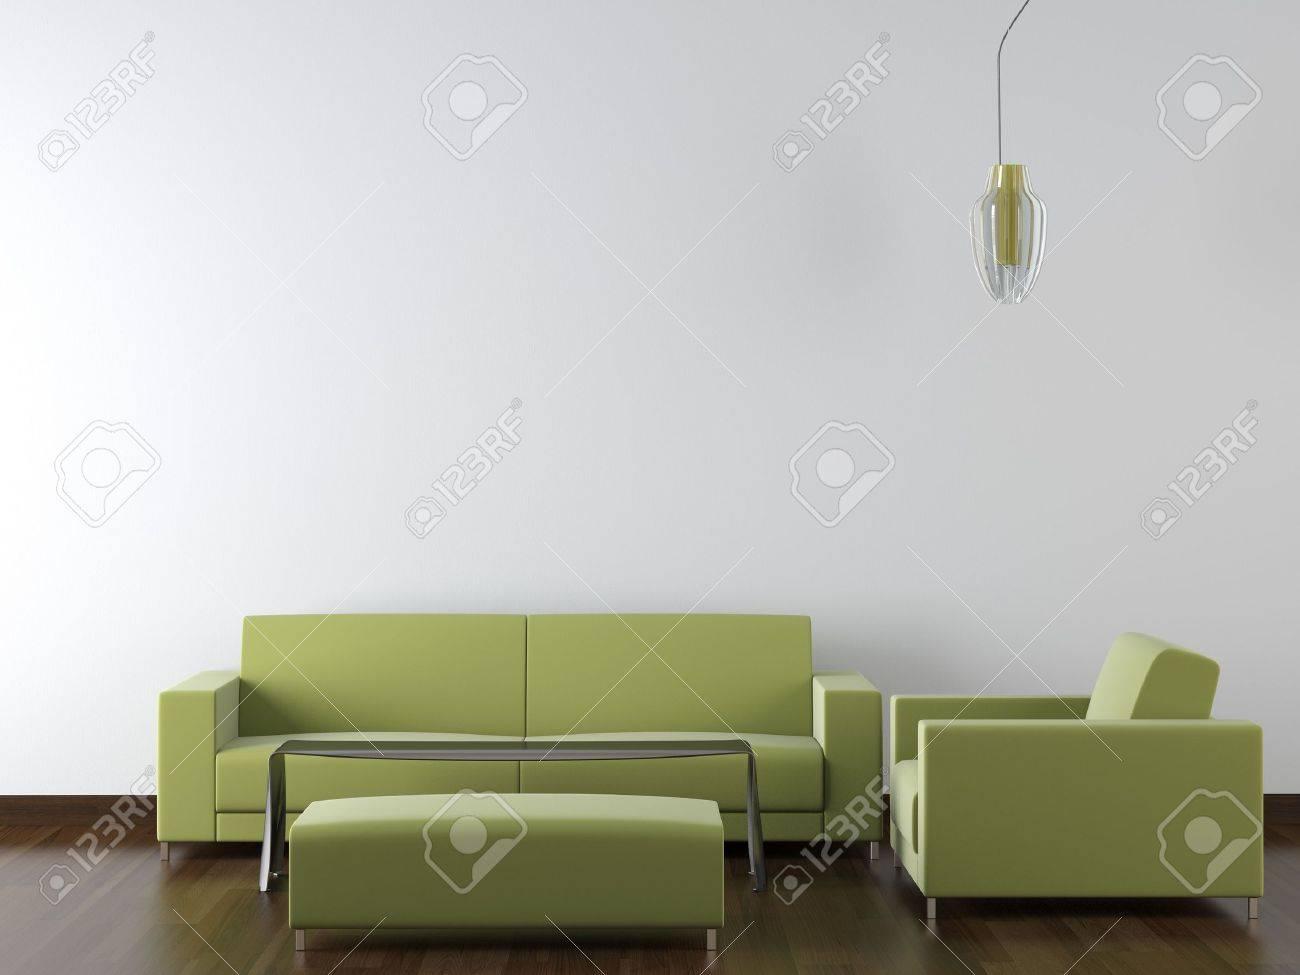 Binnenkant ontwerp van moderne groene woonkamer meubilair tegen ...